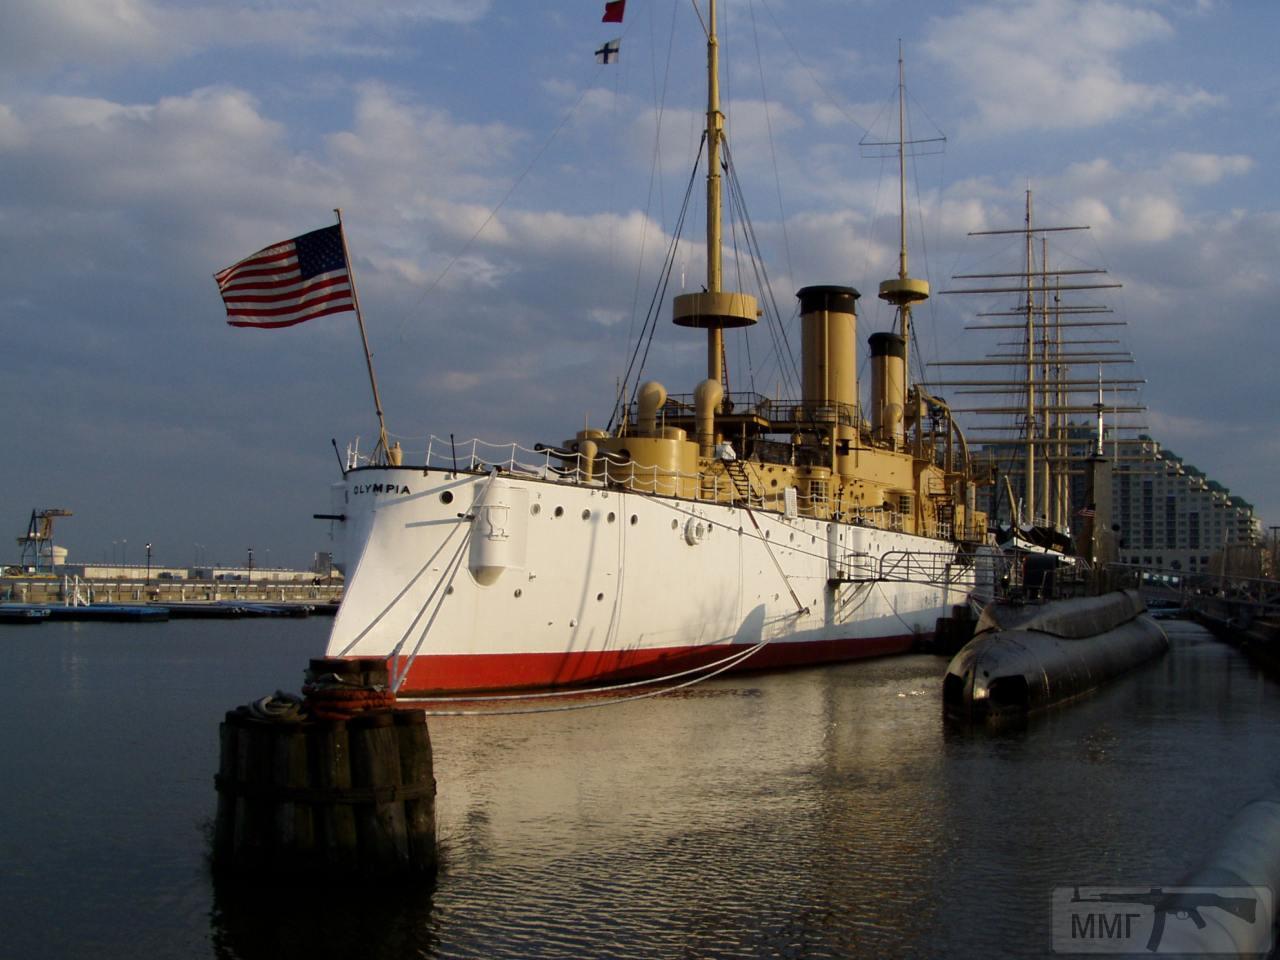 56129 - USS Olympia (C-6)